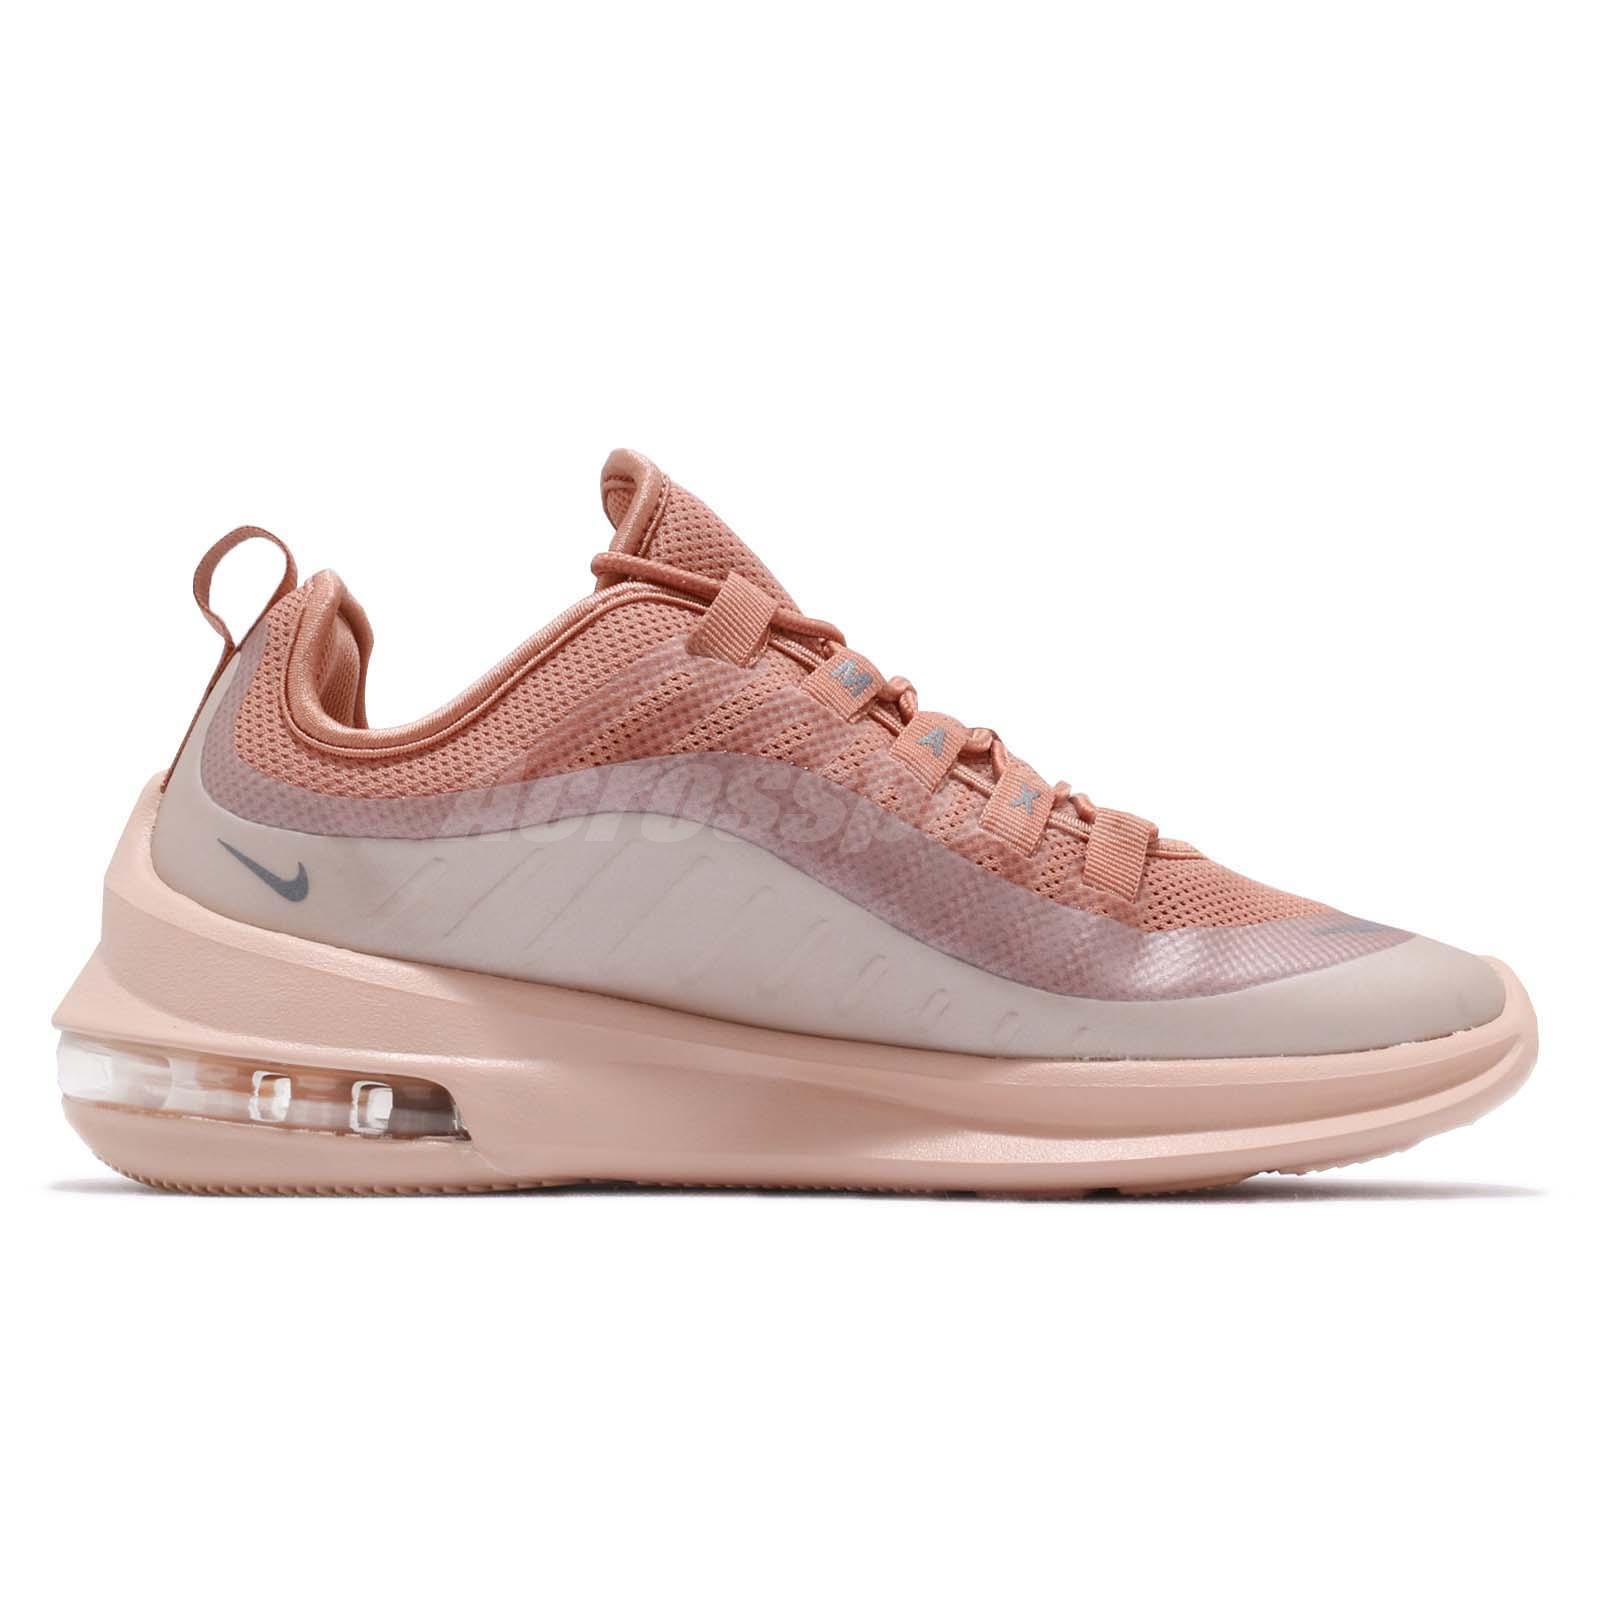 Nike Wmns Air Max Axis Terra Blush Grey Women Running Shoes Sneakers ... 27cb81dd0f348